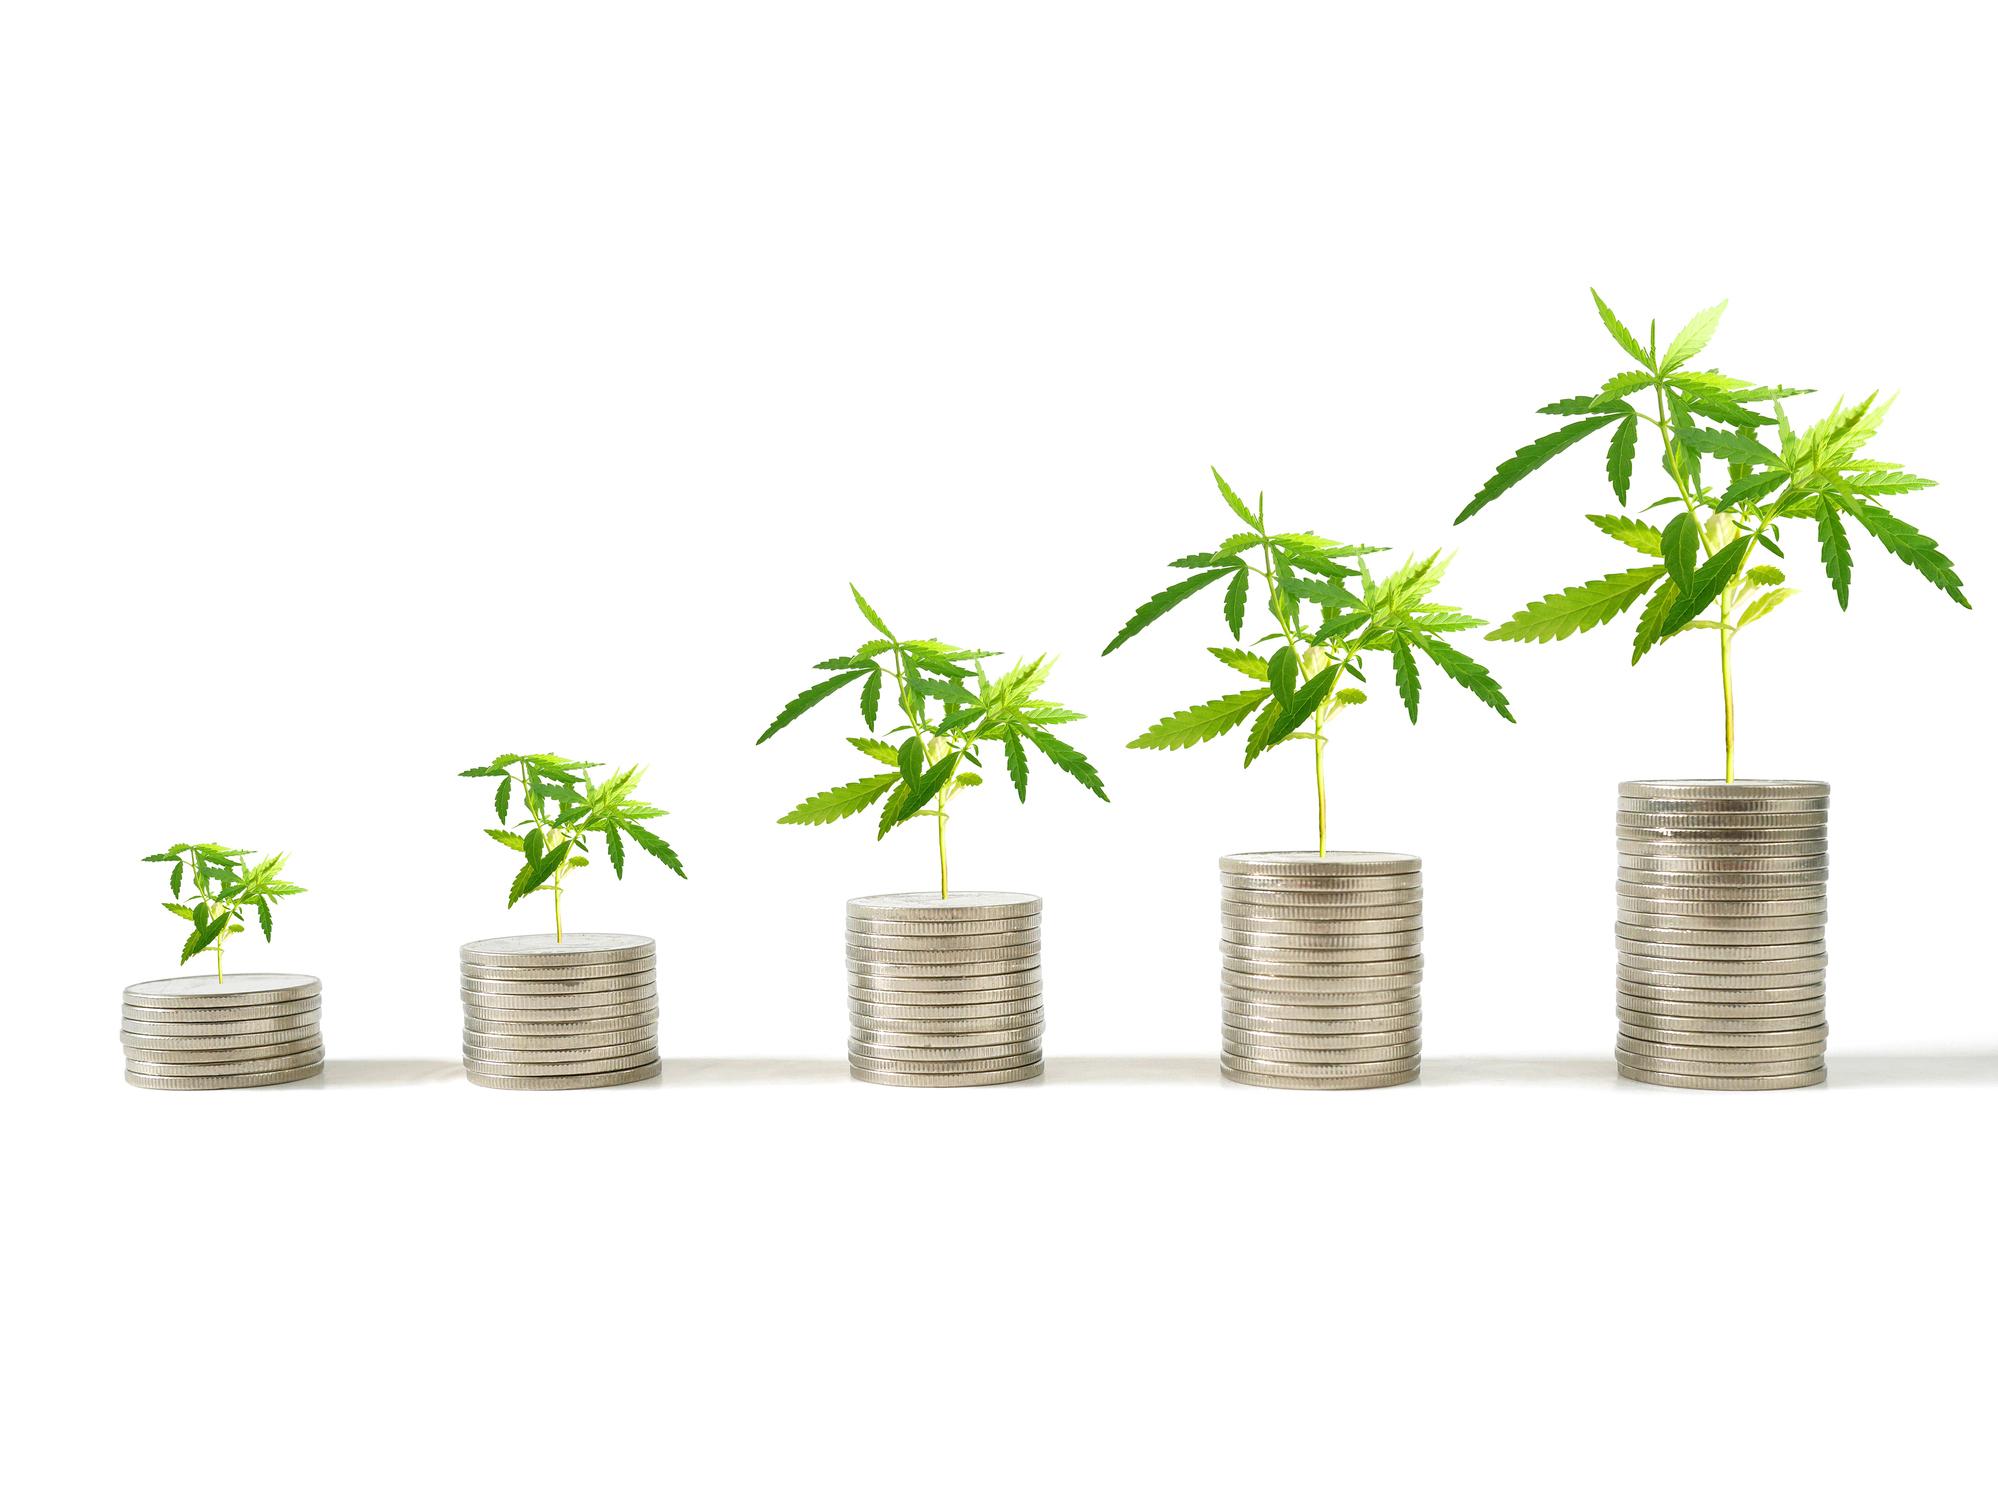 warren buffett guide to retirement investing